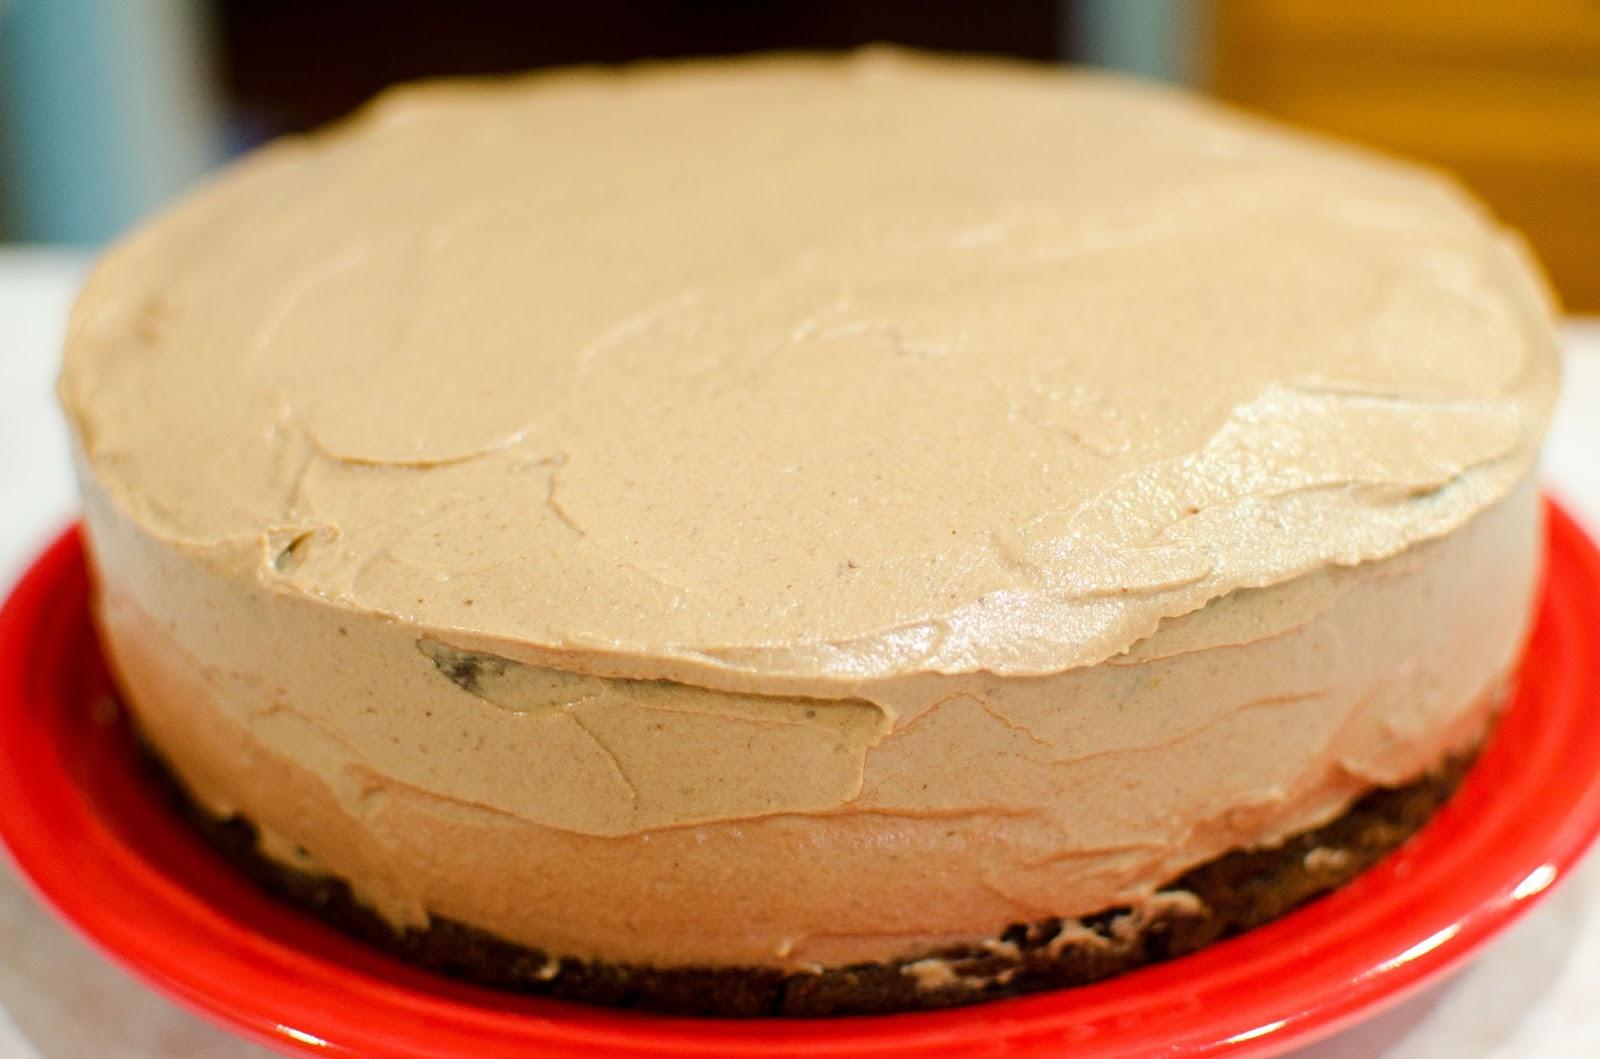 Cake Doctor Icing Recipes: NutriDude's Birthday Celebration